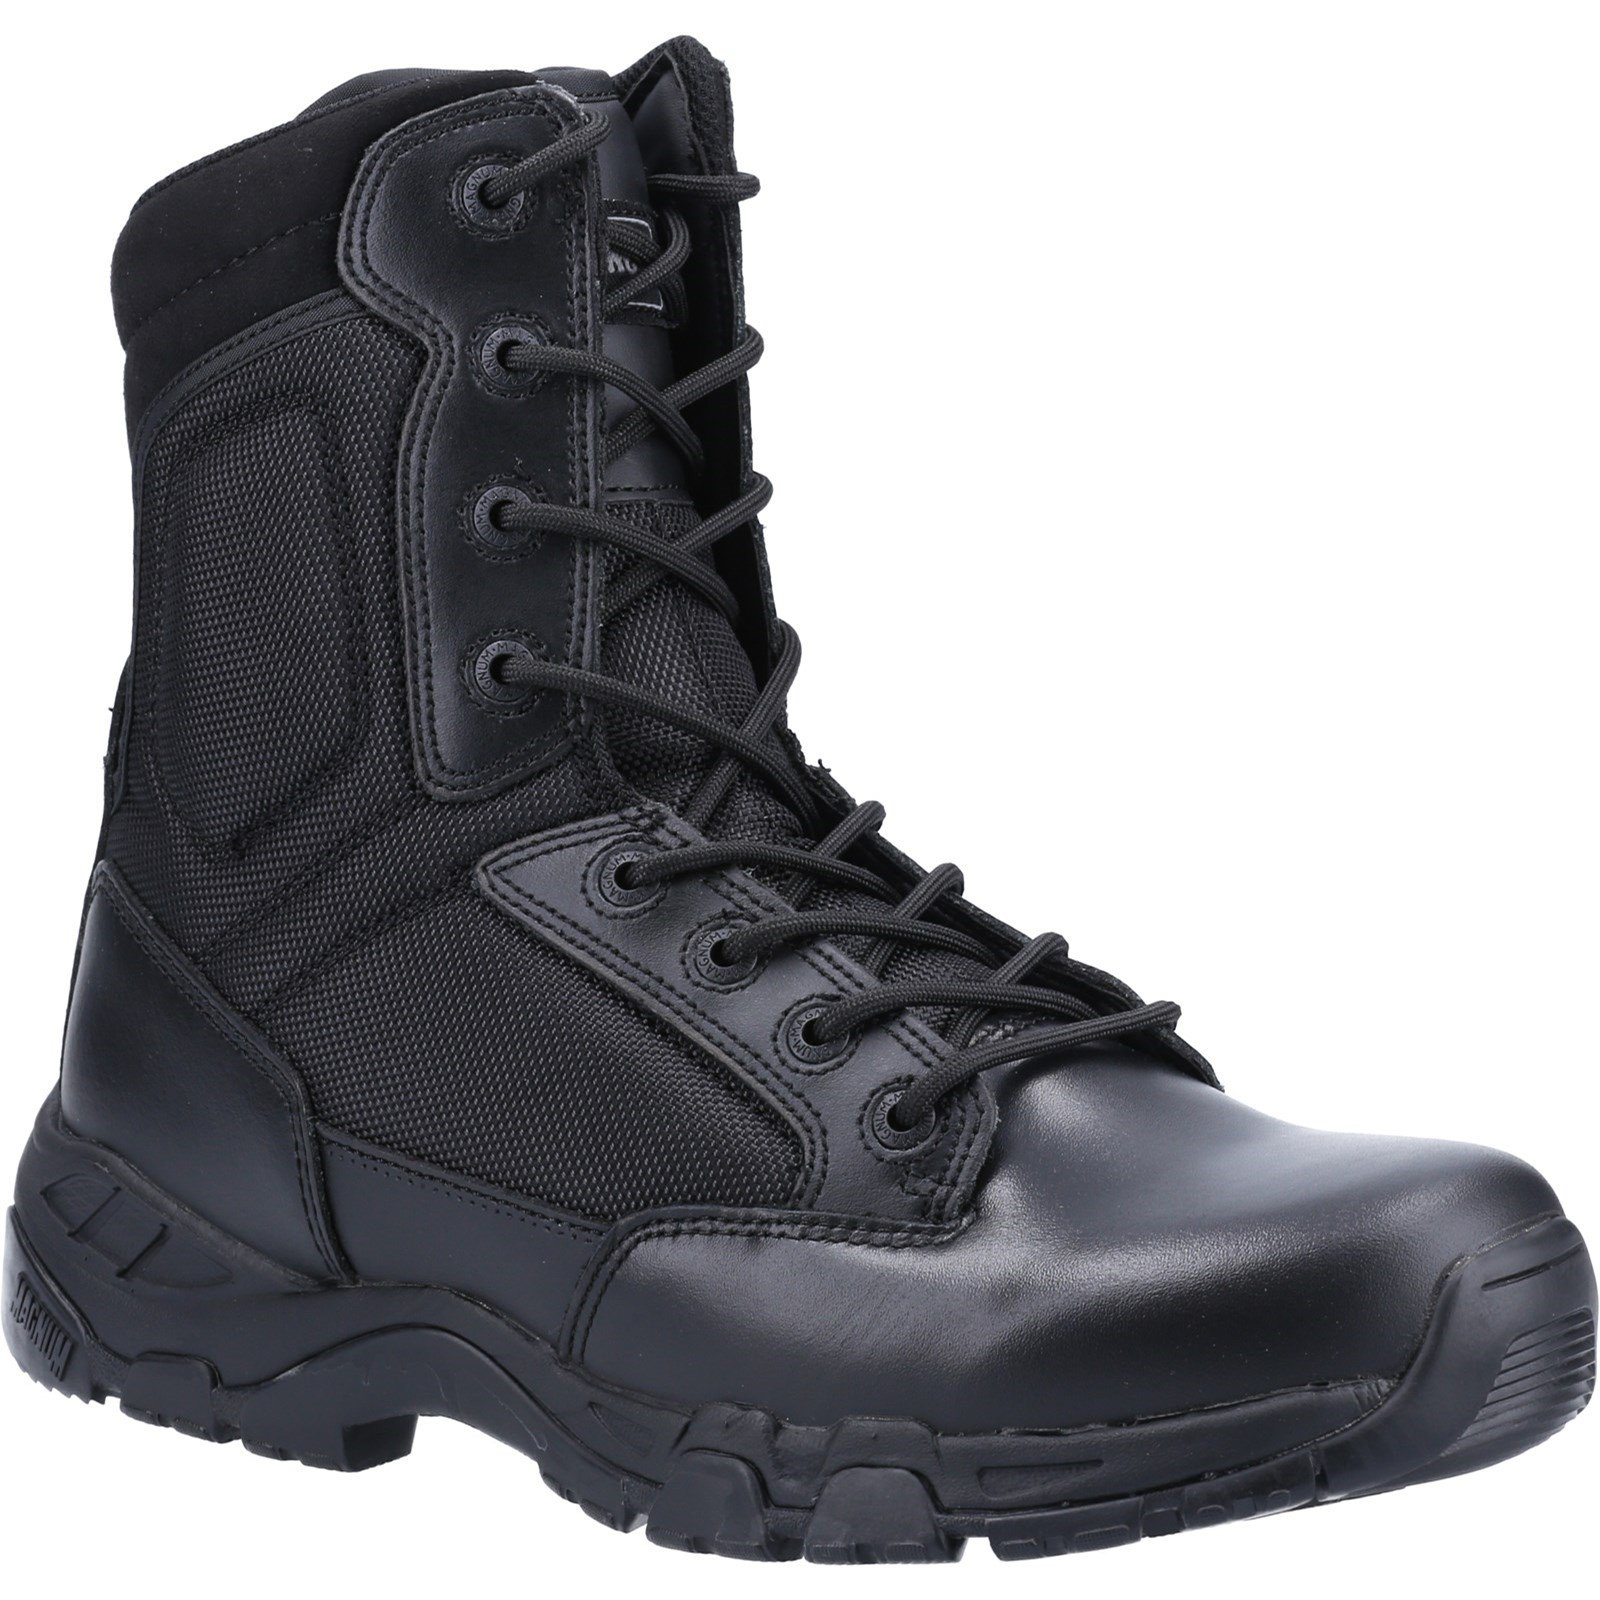 Magnum Unisex Viper Pro Plus Side-Zip Uniform Boot Black 33533 - Black 7